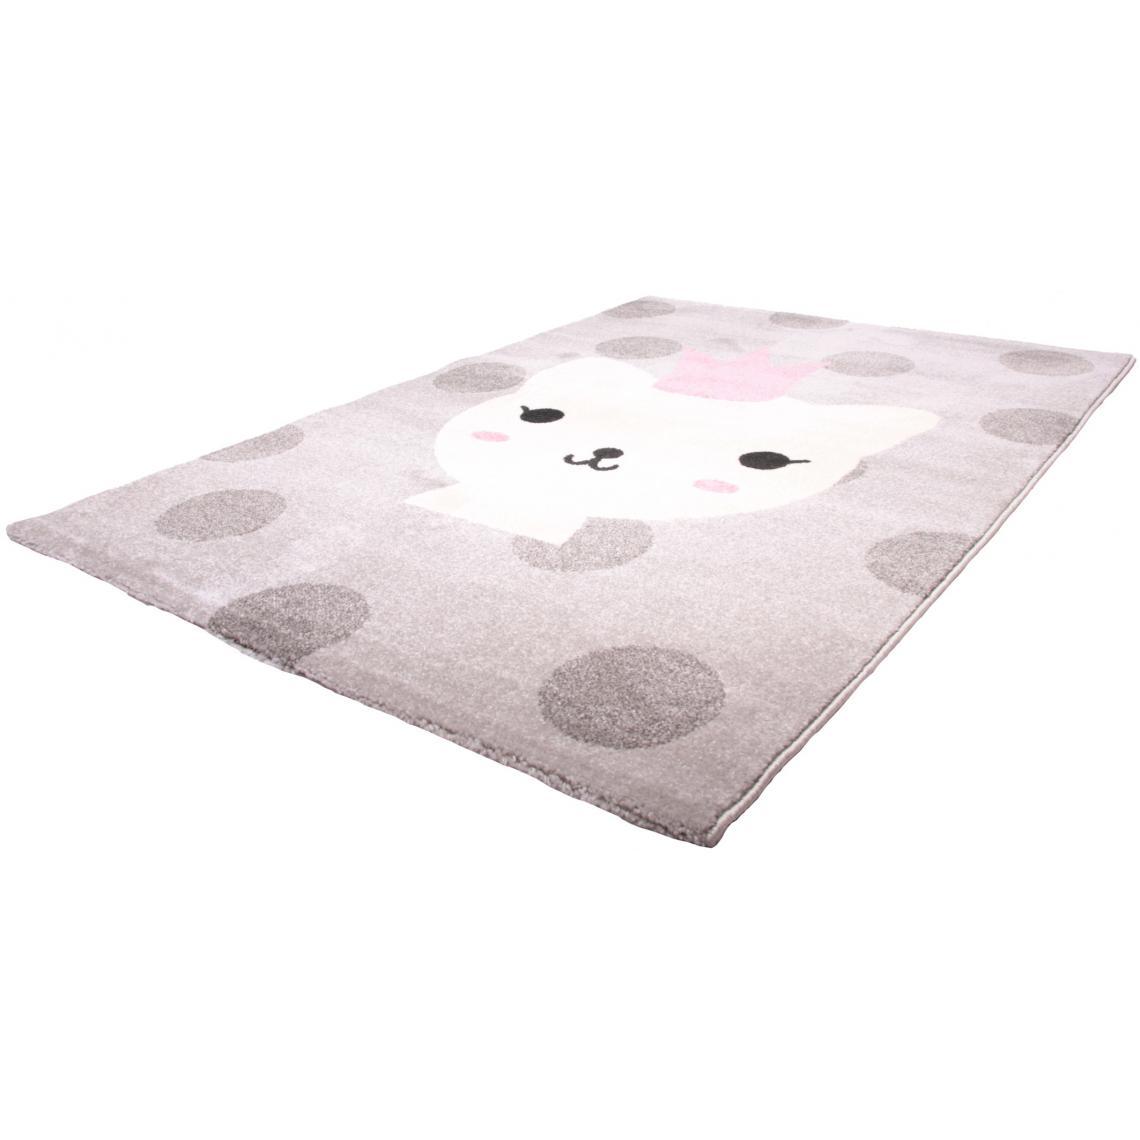 tapis enfant princesse chat 120x170cm lanna